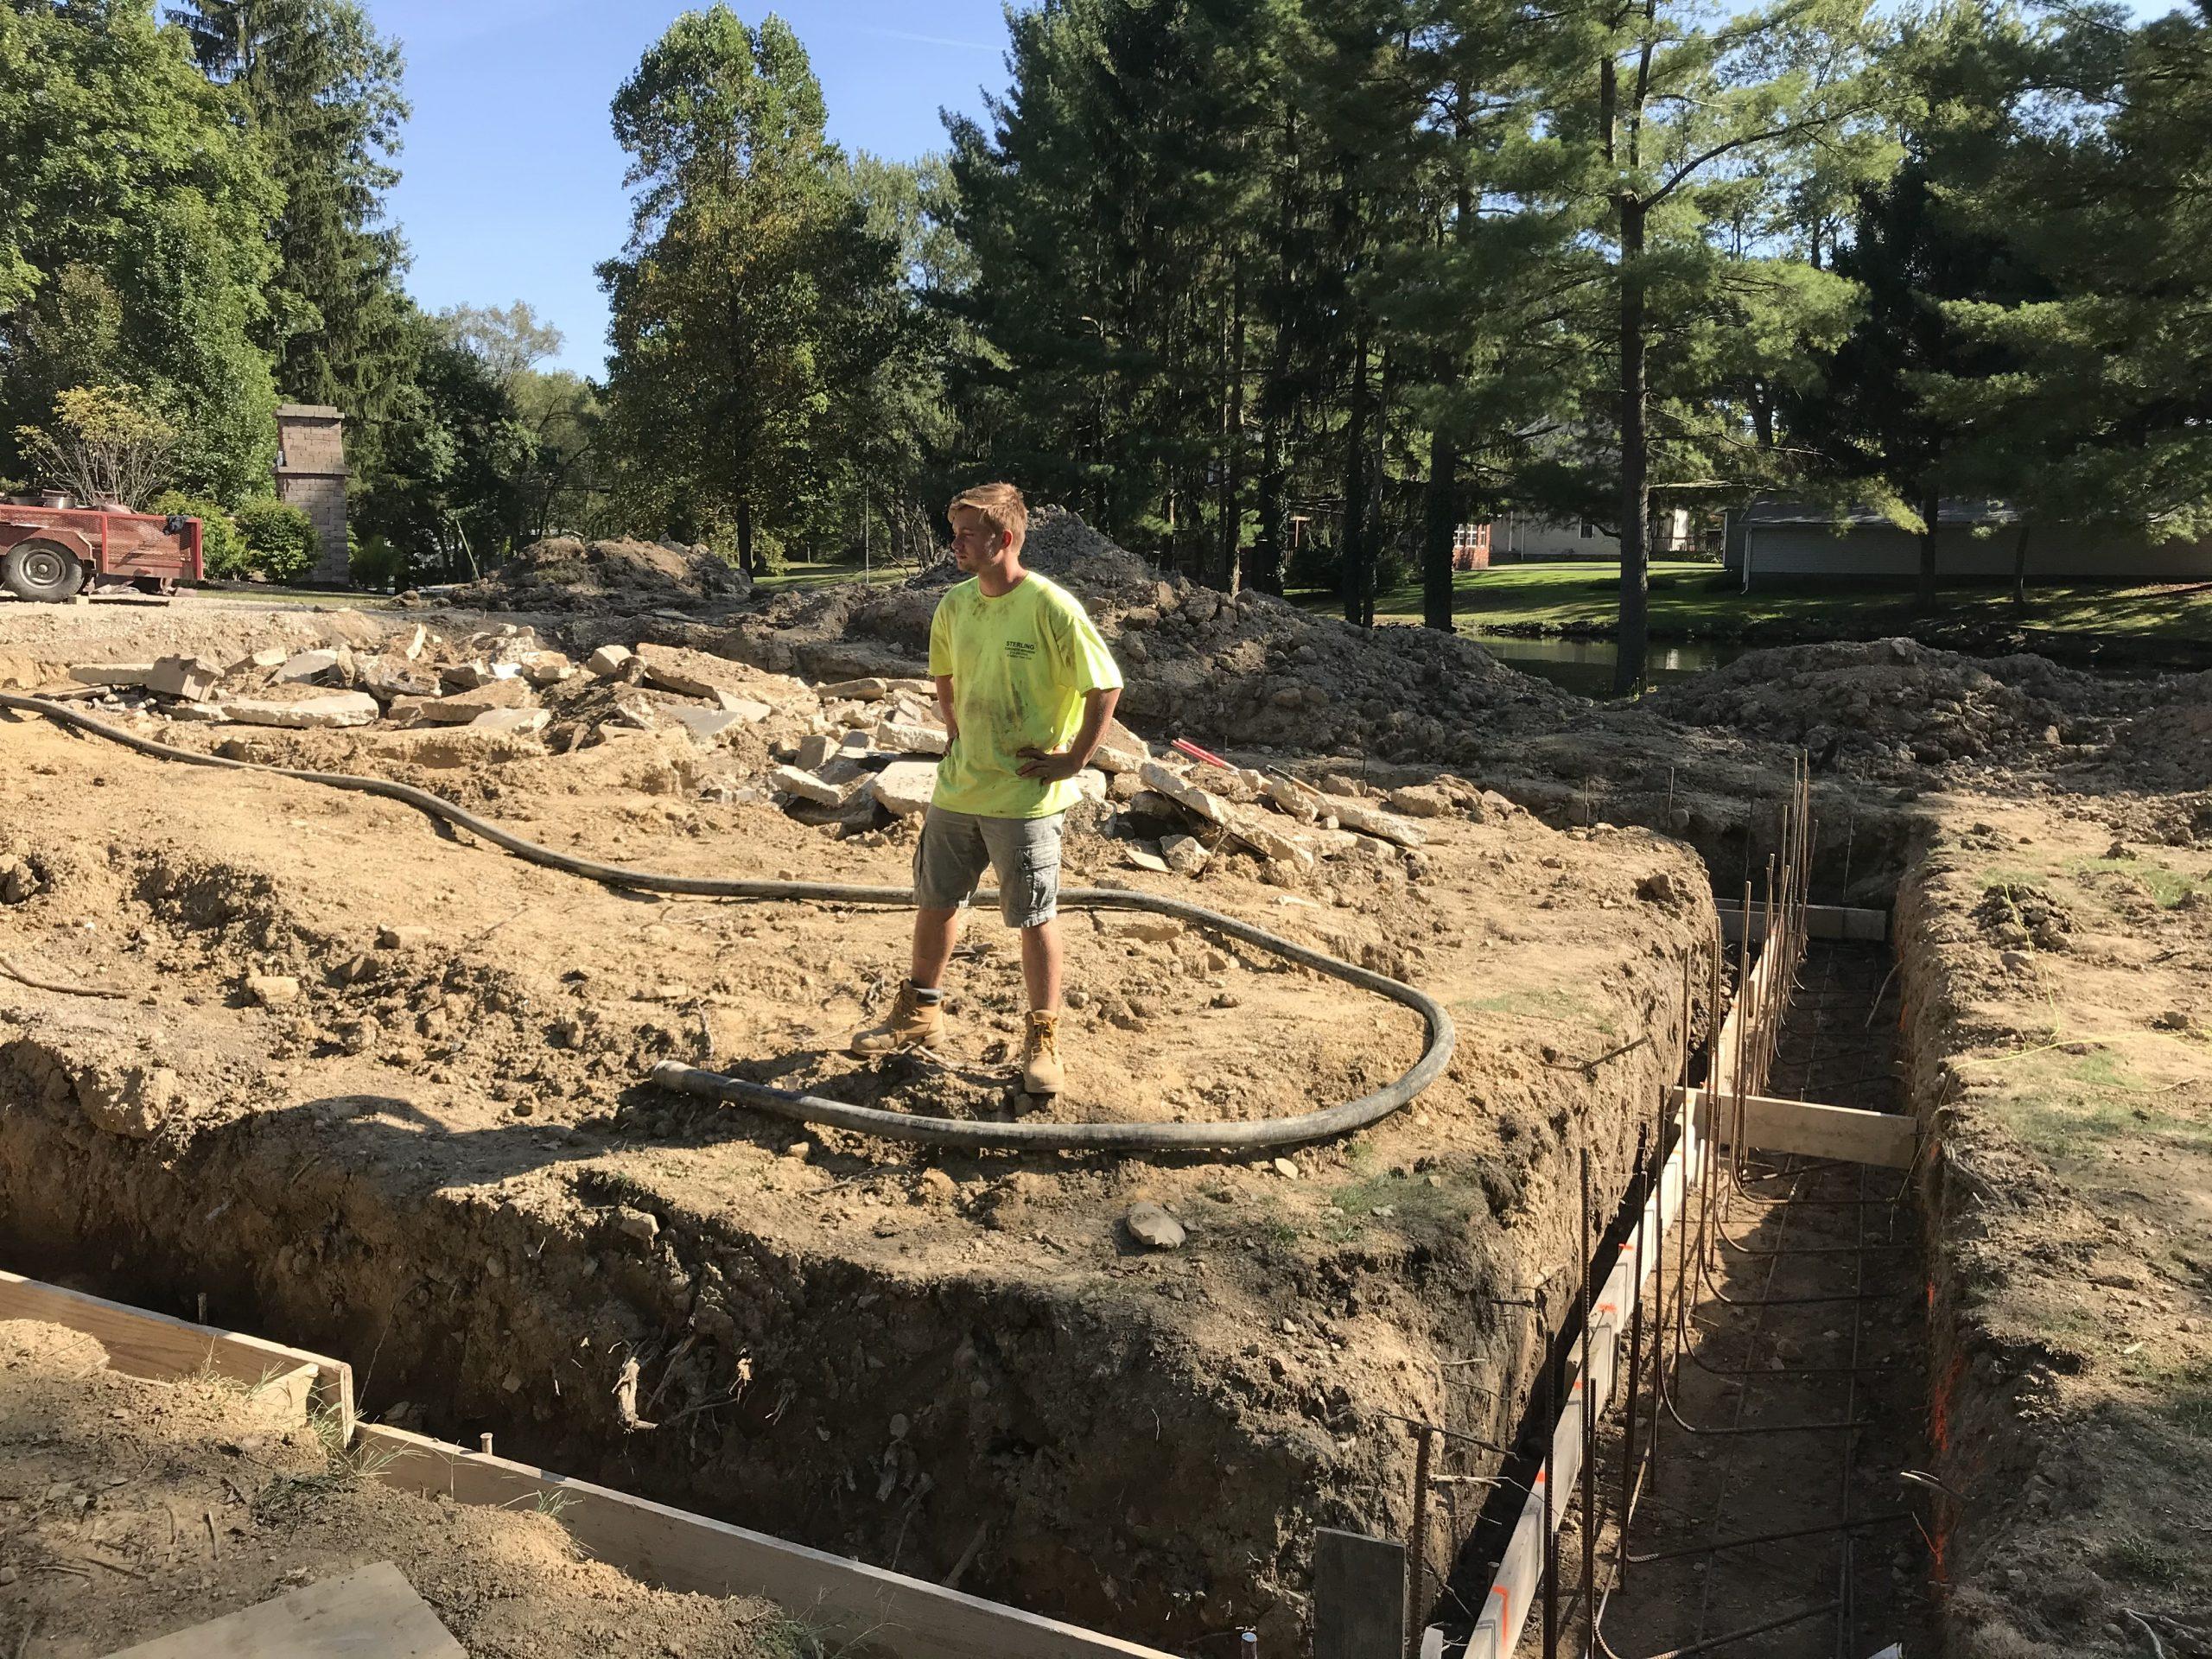 Concrete Contractor, Cement Driveway, Topcoat Sealant, Fix Cement